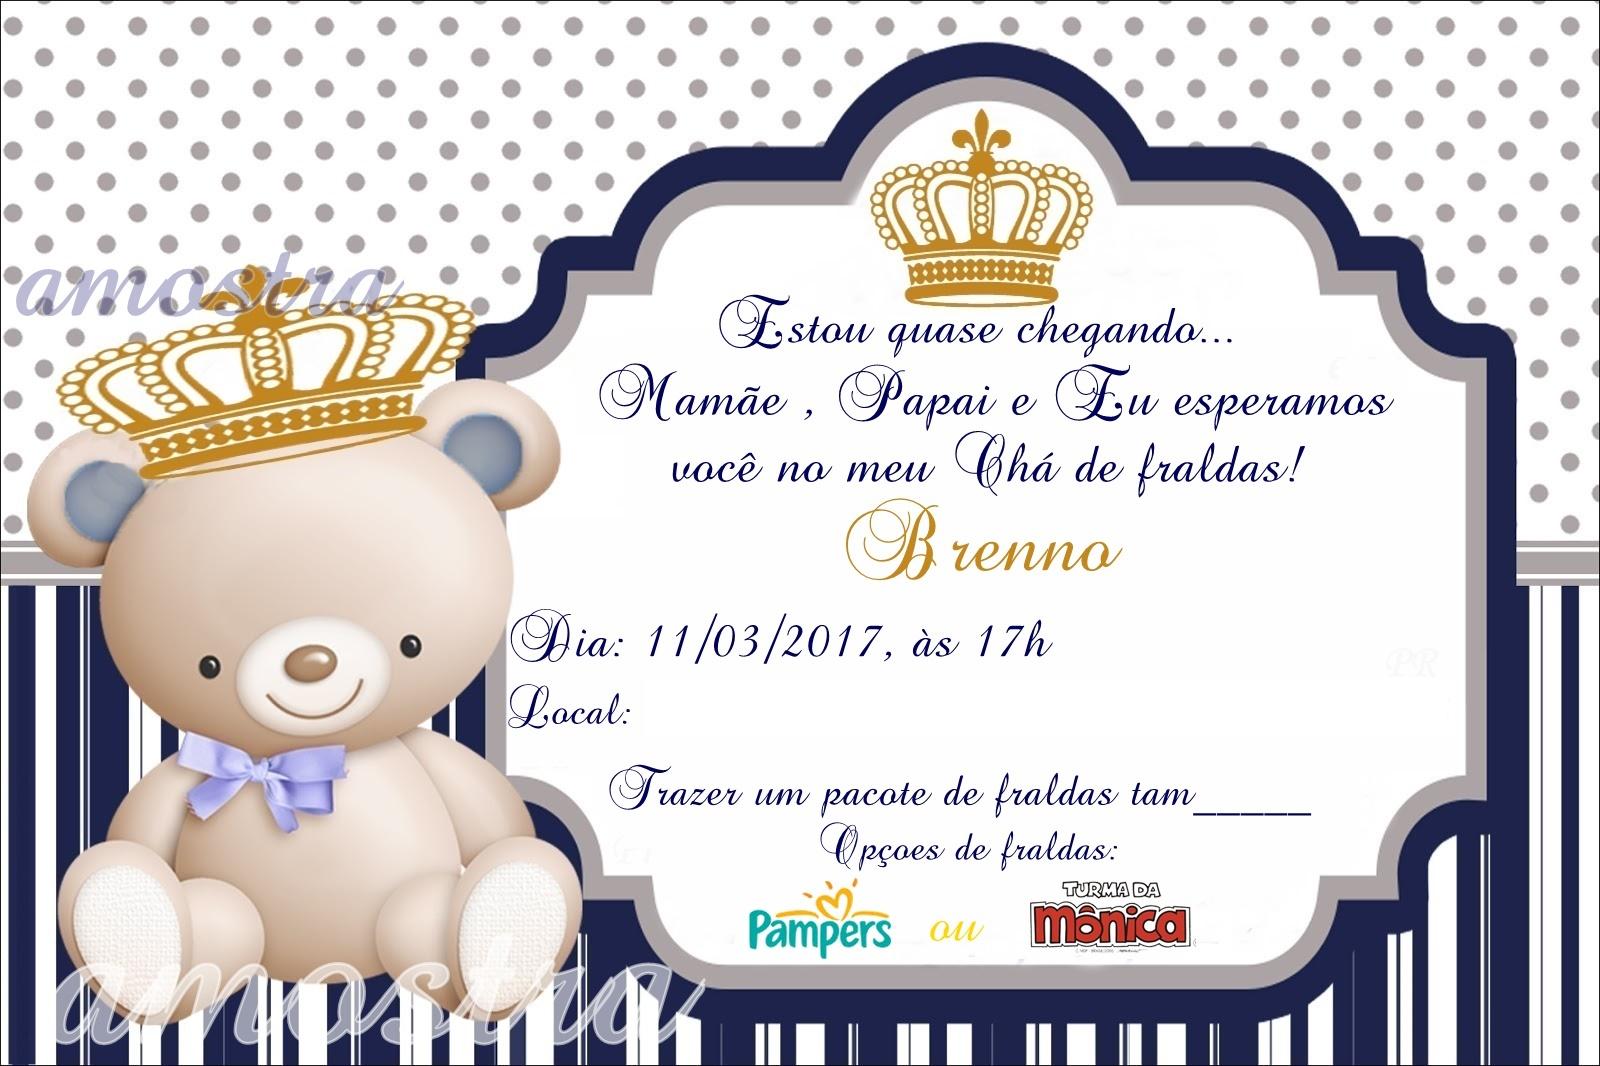 Convite Cha De Bebê Urso Coroa No Elo7 Acriativa Presentes 7db579